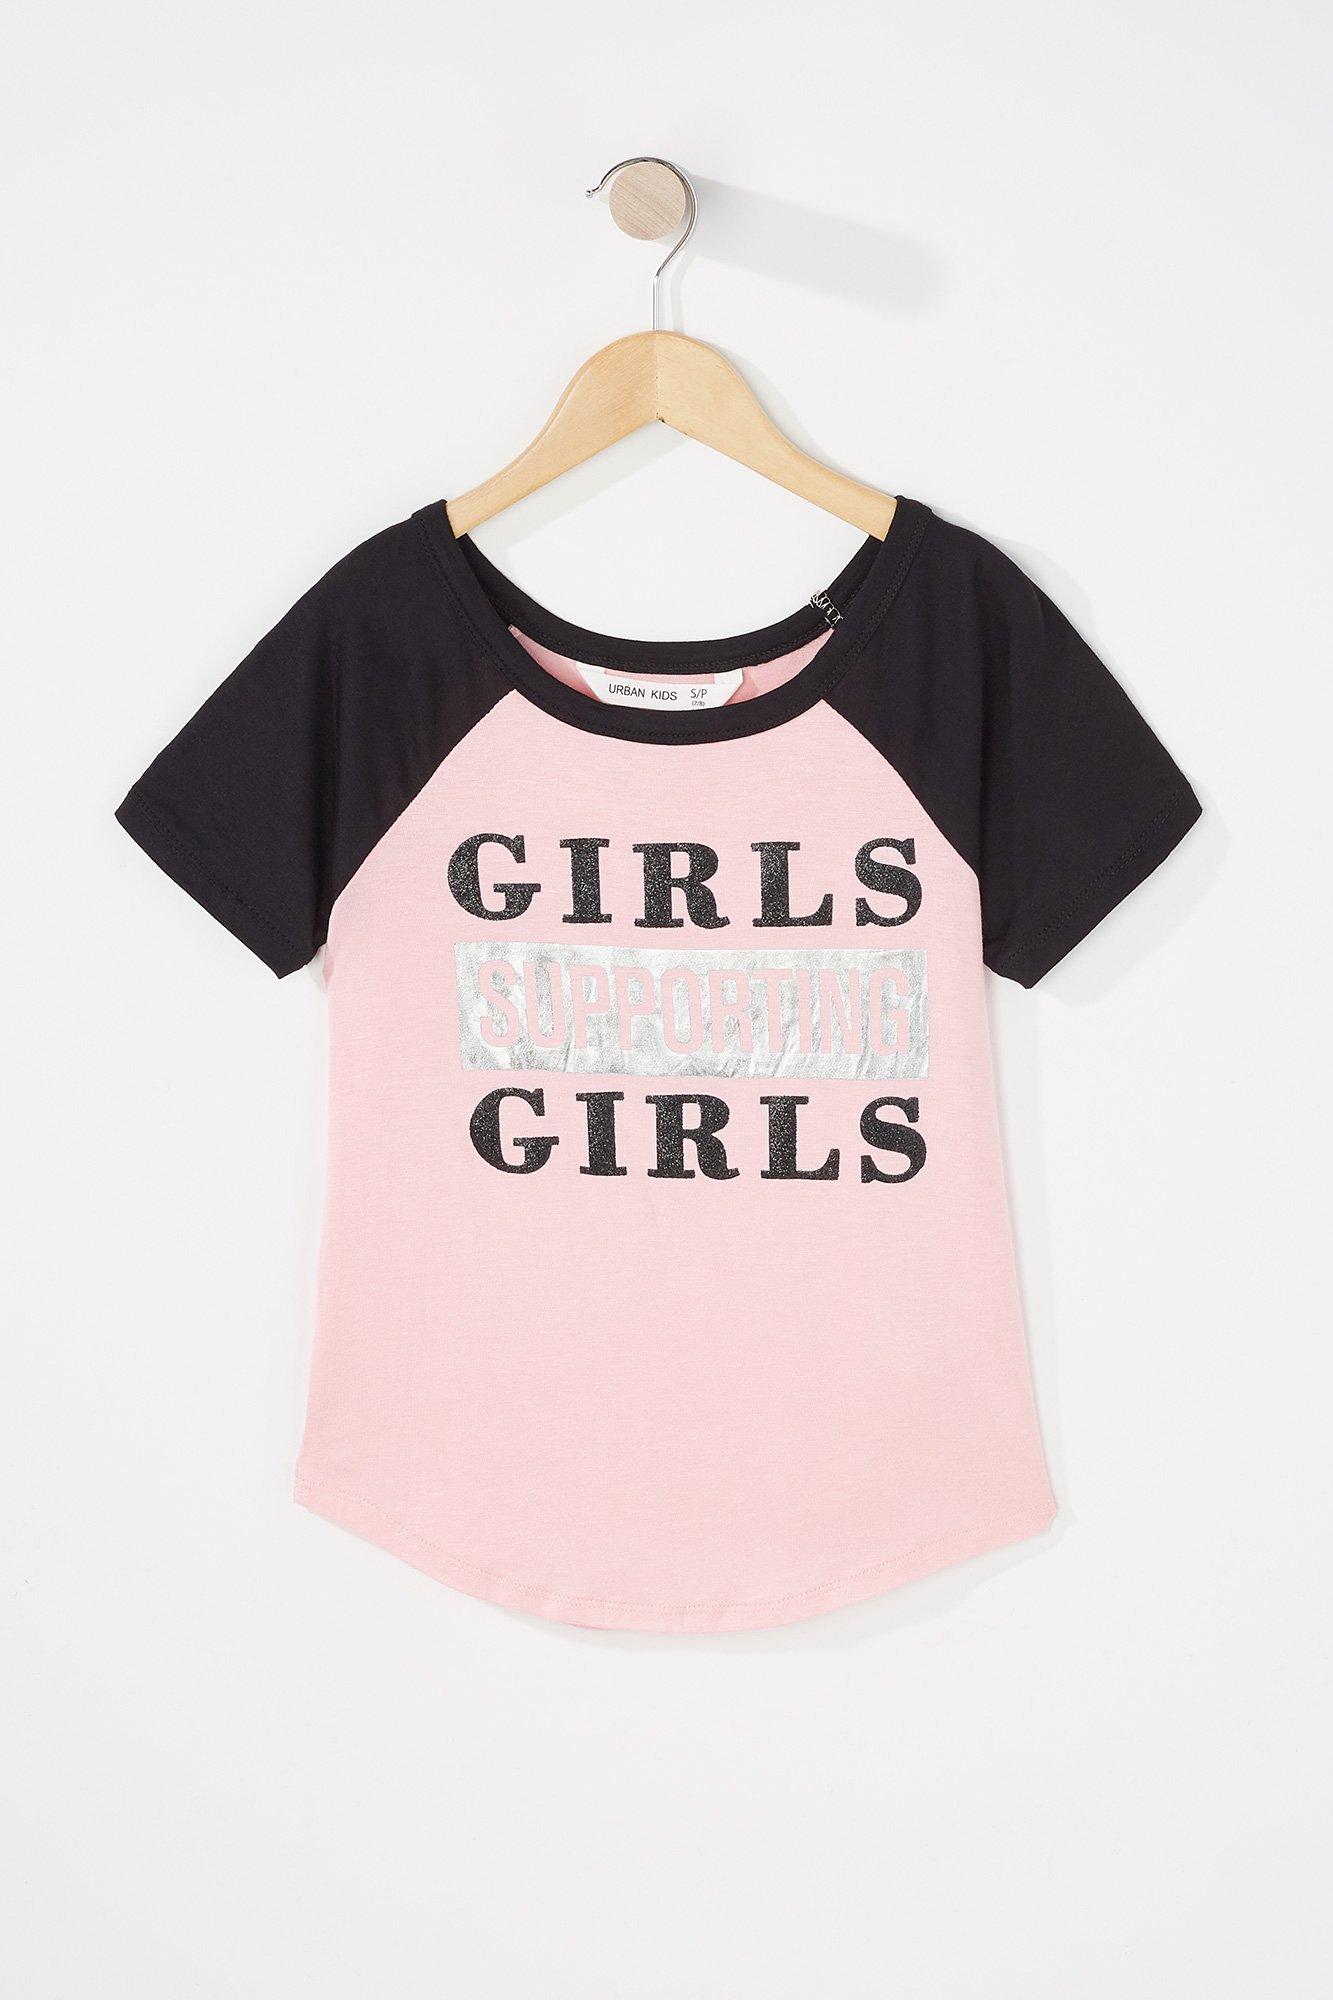 Urban Kids Youth Girl\'s Girls Colour Block Graphic T-Shirt